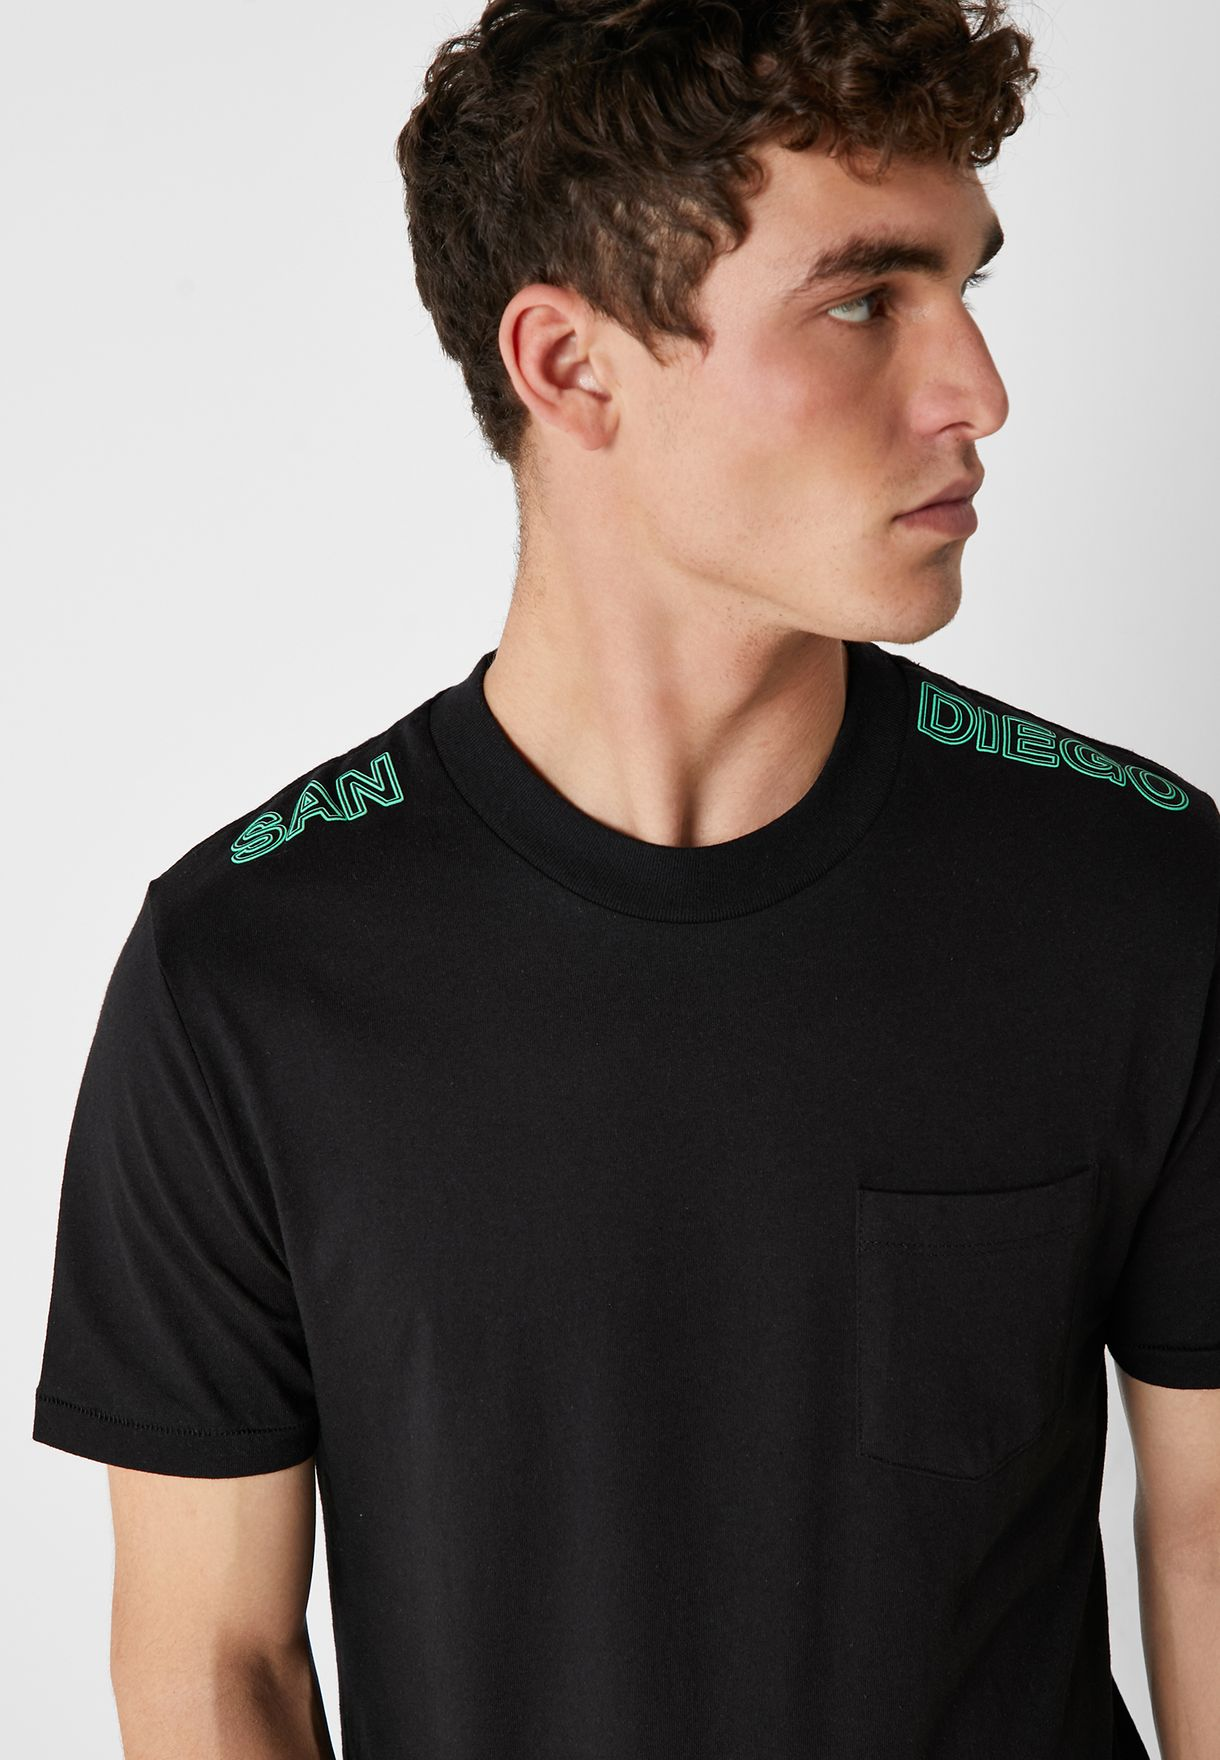 Ashers Chest Pocket Crew Neck T- Shirt